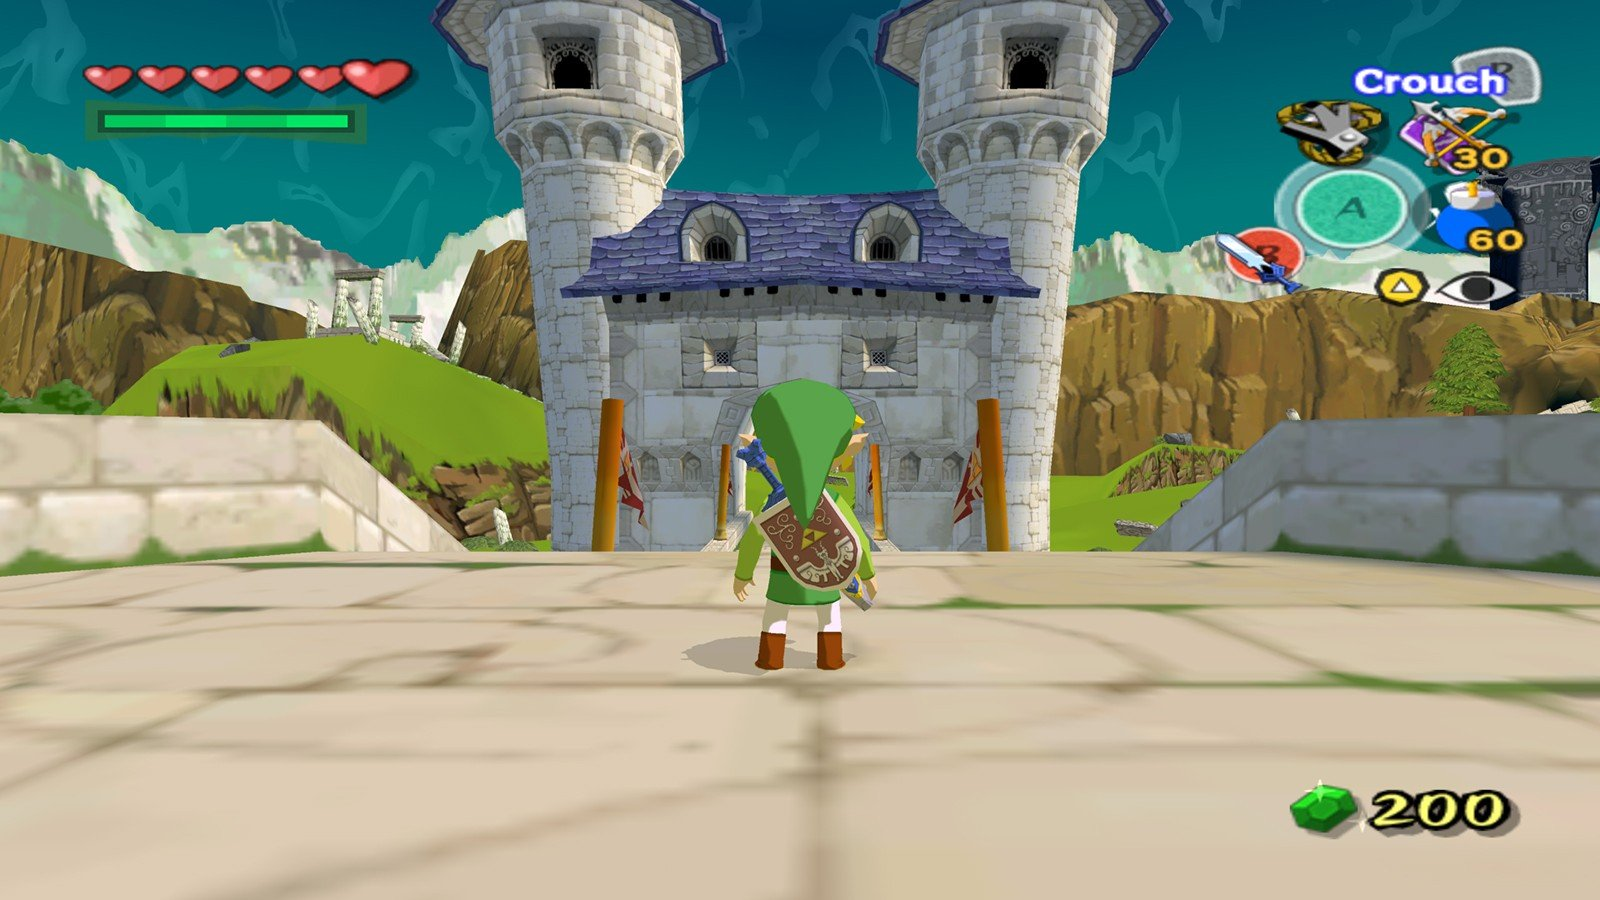 The Legend of Zelda: The Wind Waker HD puede completarse en treinta minutos con un glitch